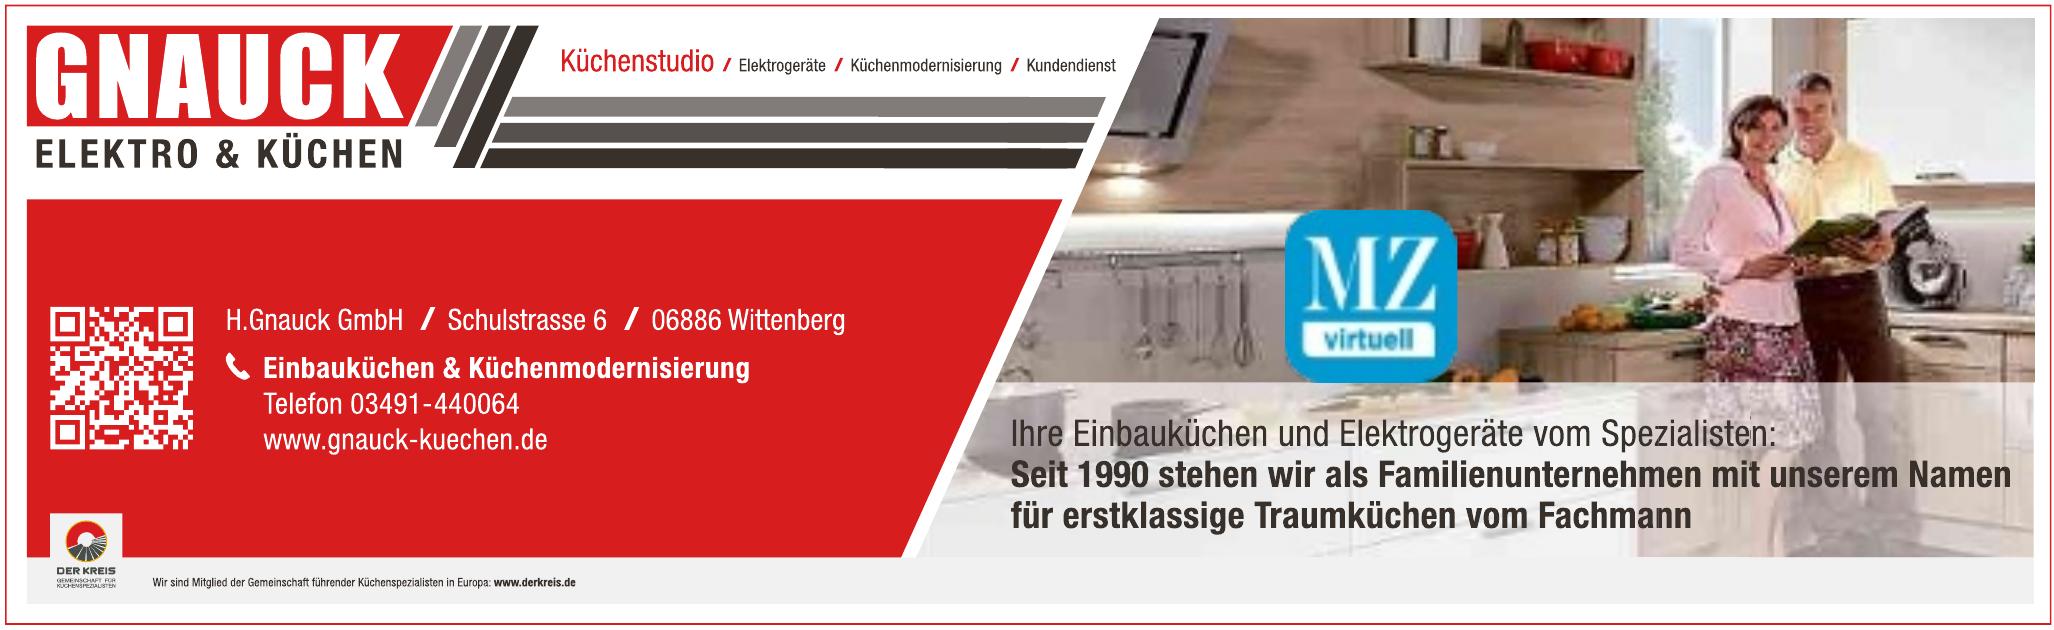 H. Gnauck GmbH